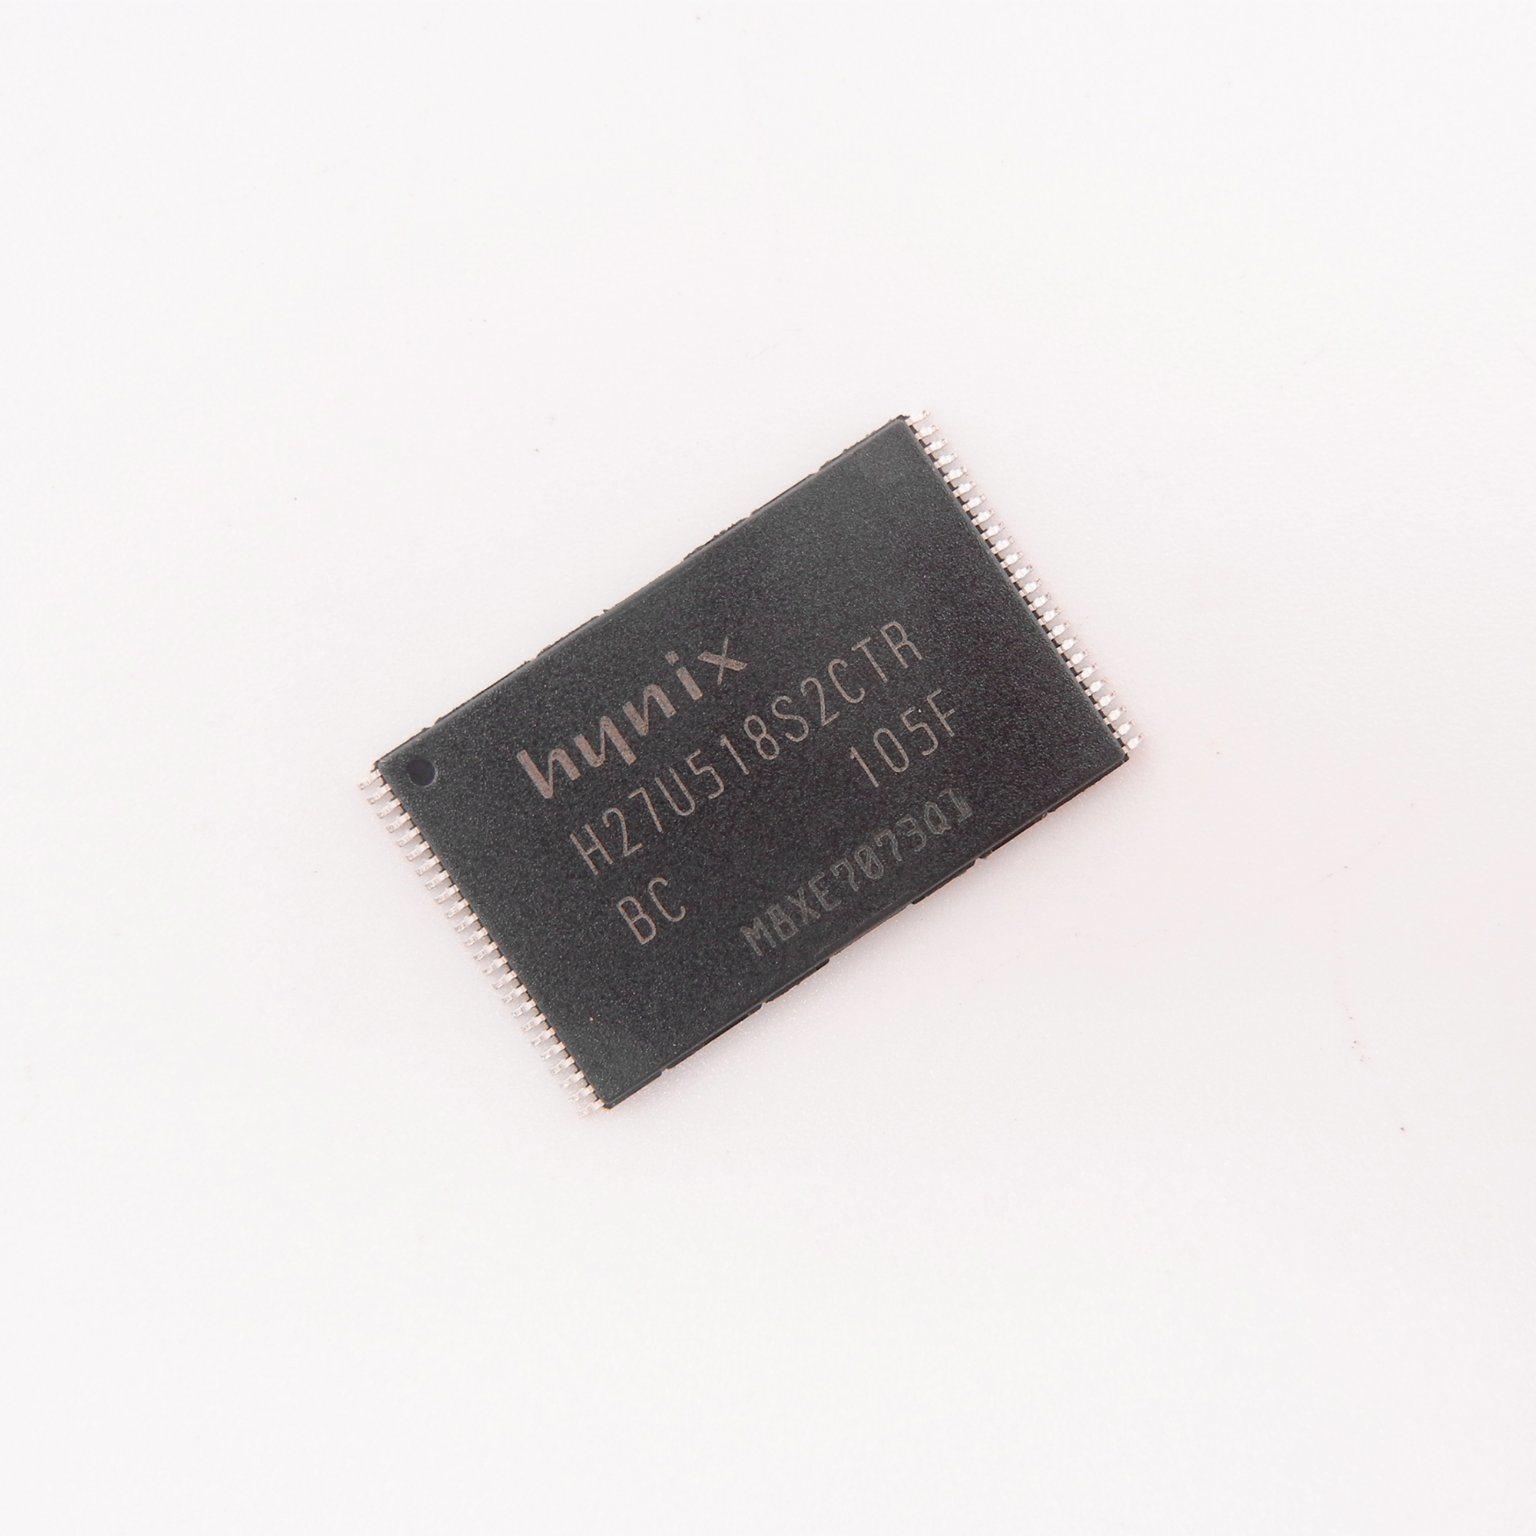 China H27u518s2ctr Bc New And Original Ic Integrated Circuits Circuit Electronic Power Transistor Resistor